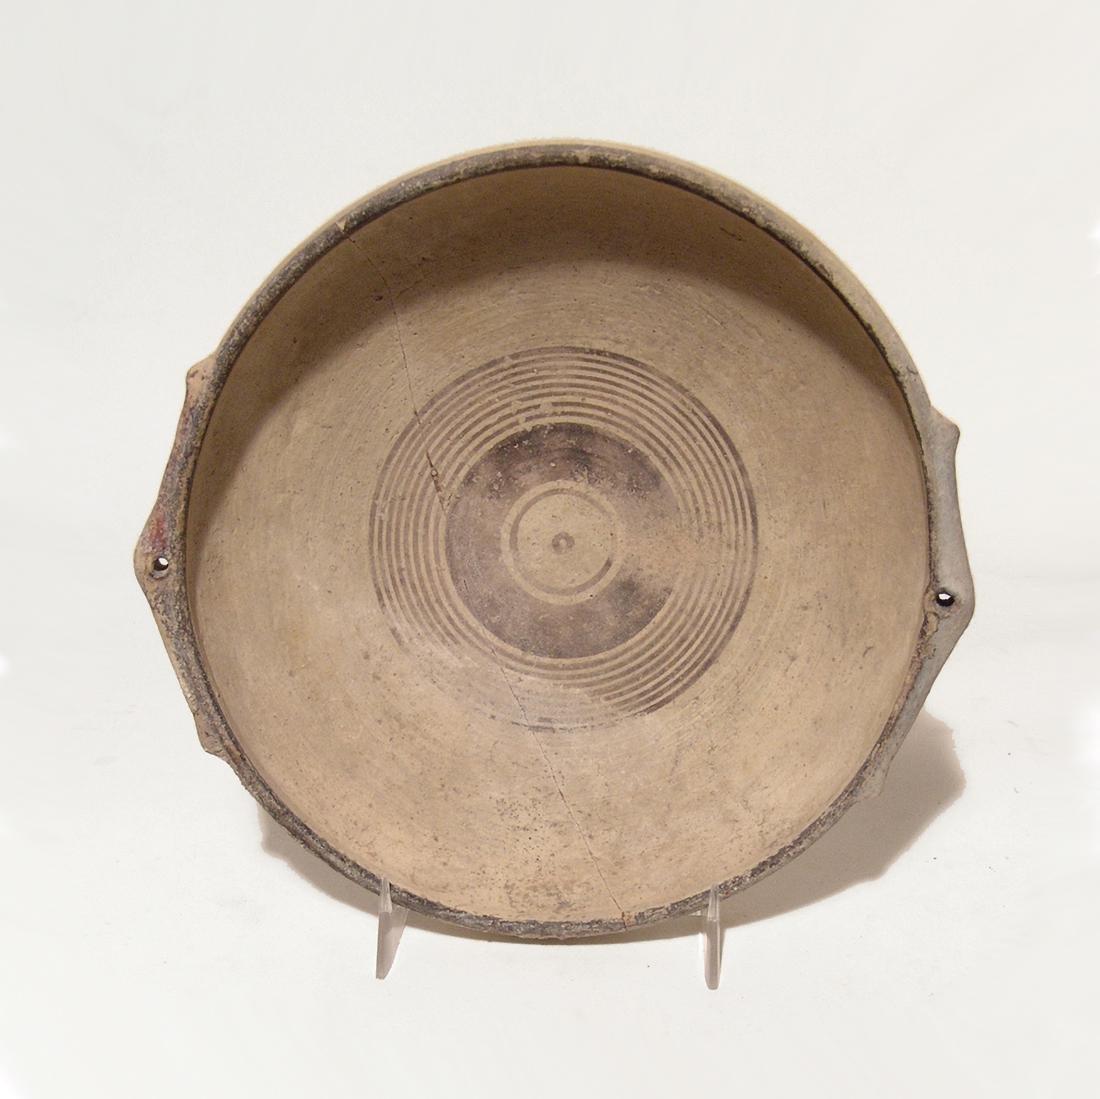 A nice Cypriot bichrome bowl